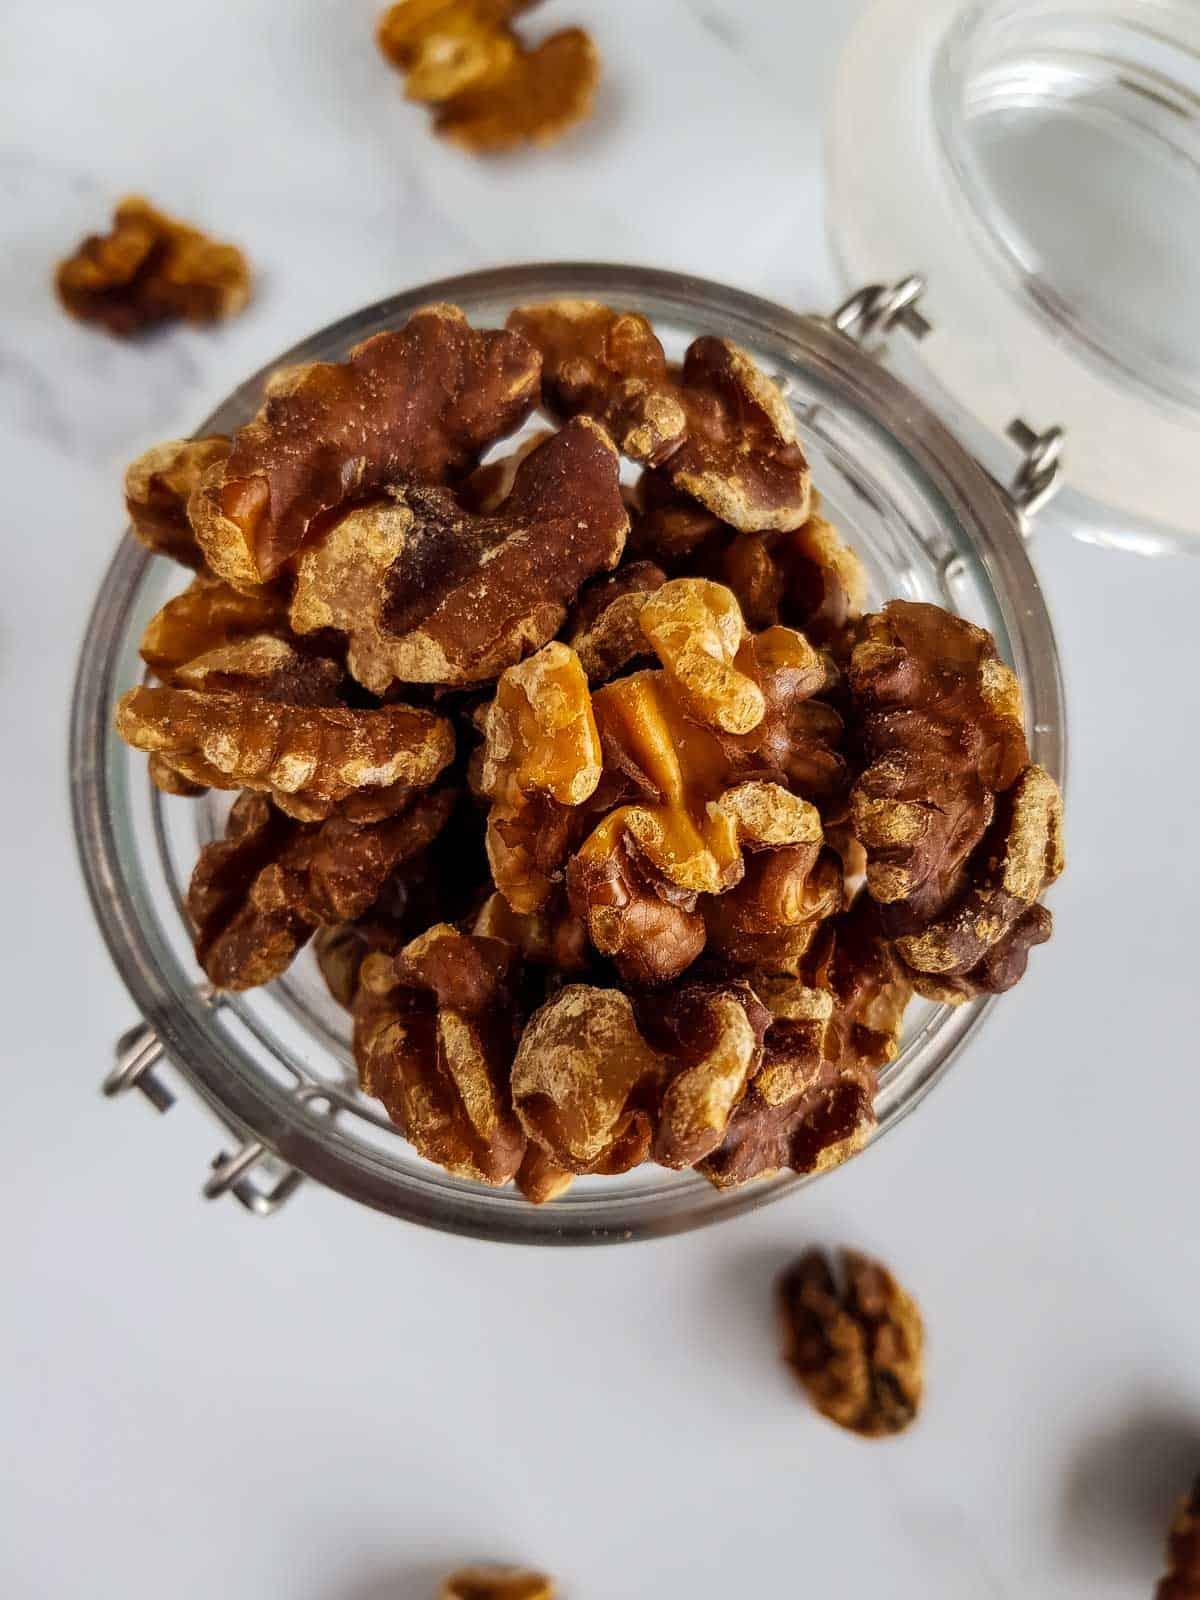 Roasted walnuts in a jar.